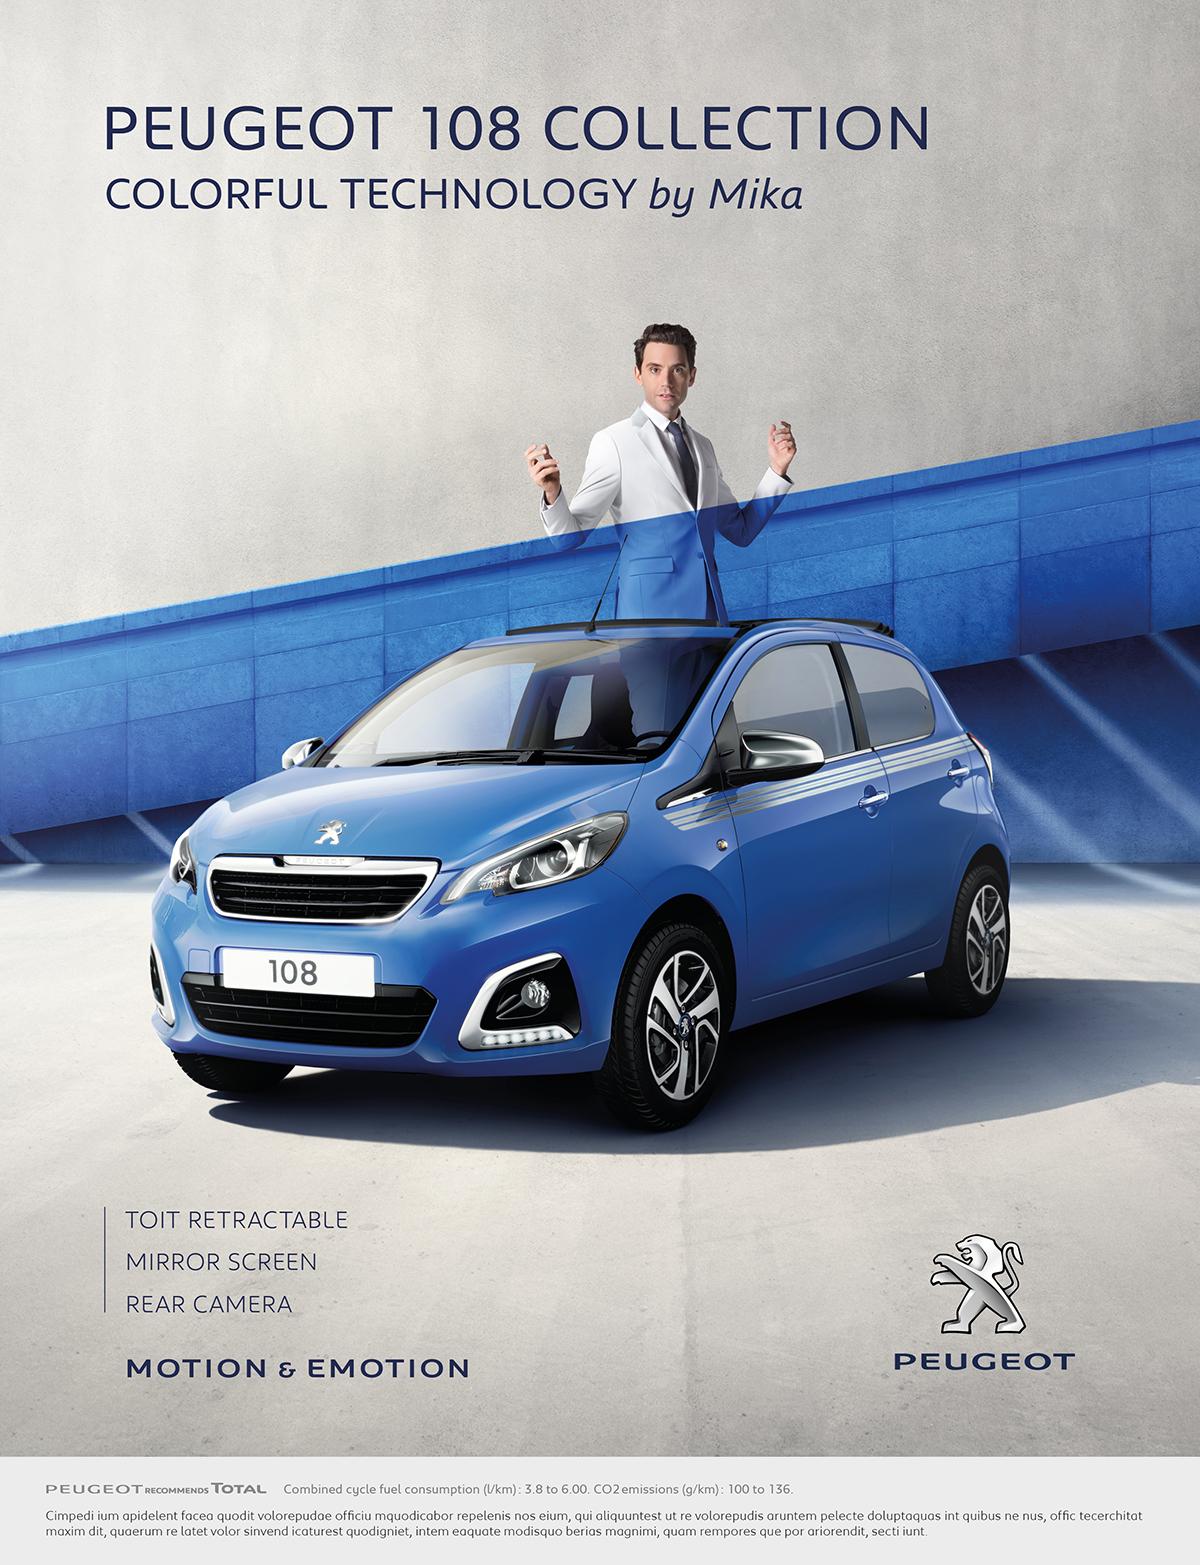 Peugeot_108xMika_BD.jpg?format=1500w